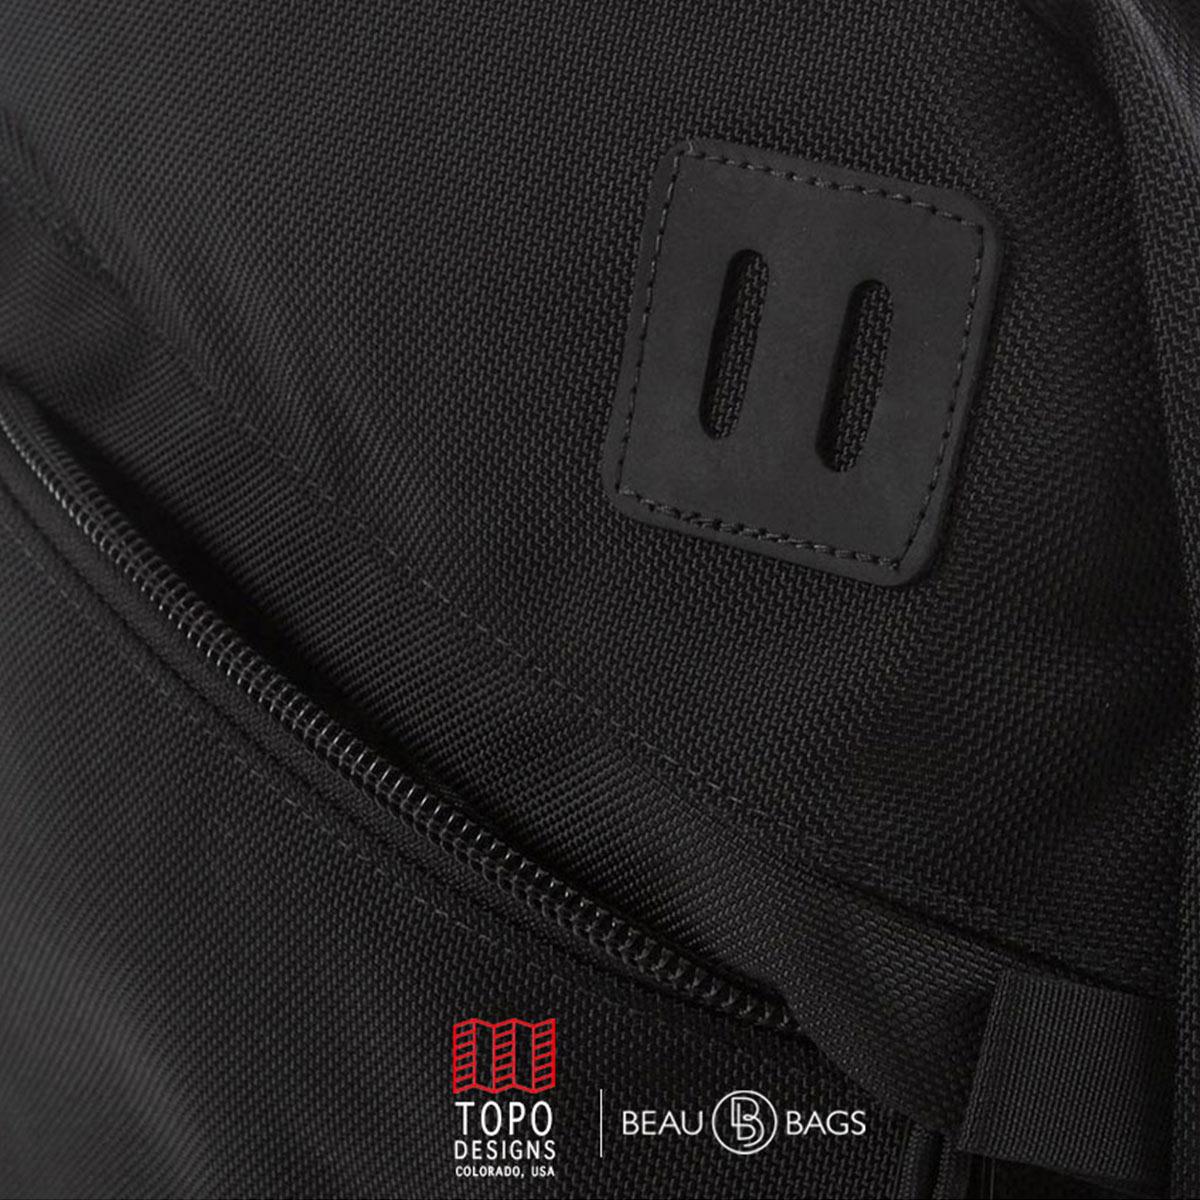 Topo Designs Daypack Ballistic Black Leather, ook op vakantie je beste vriend